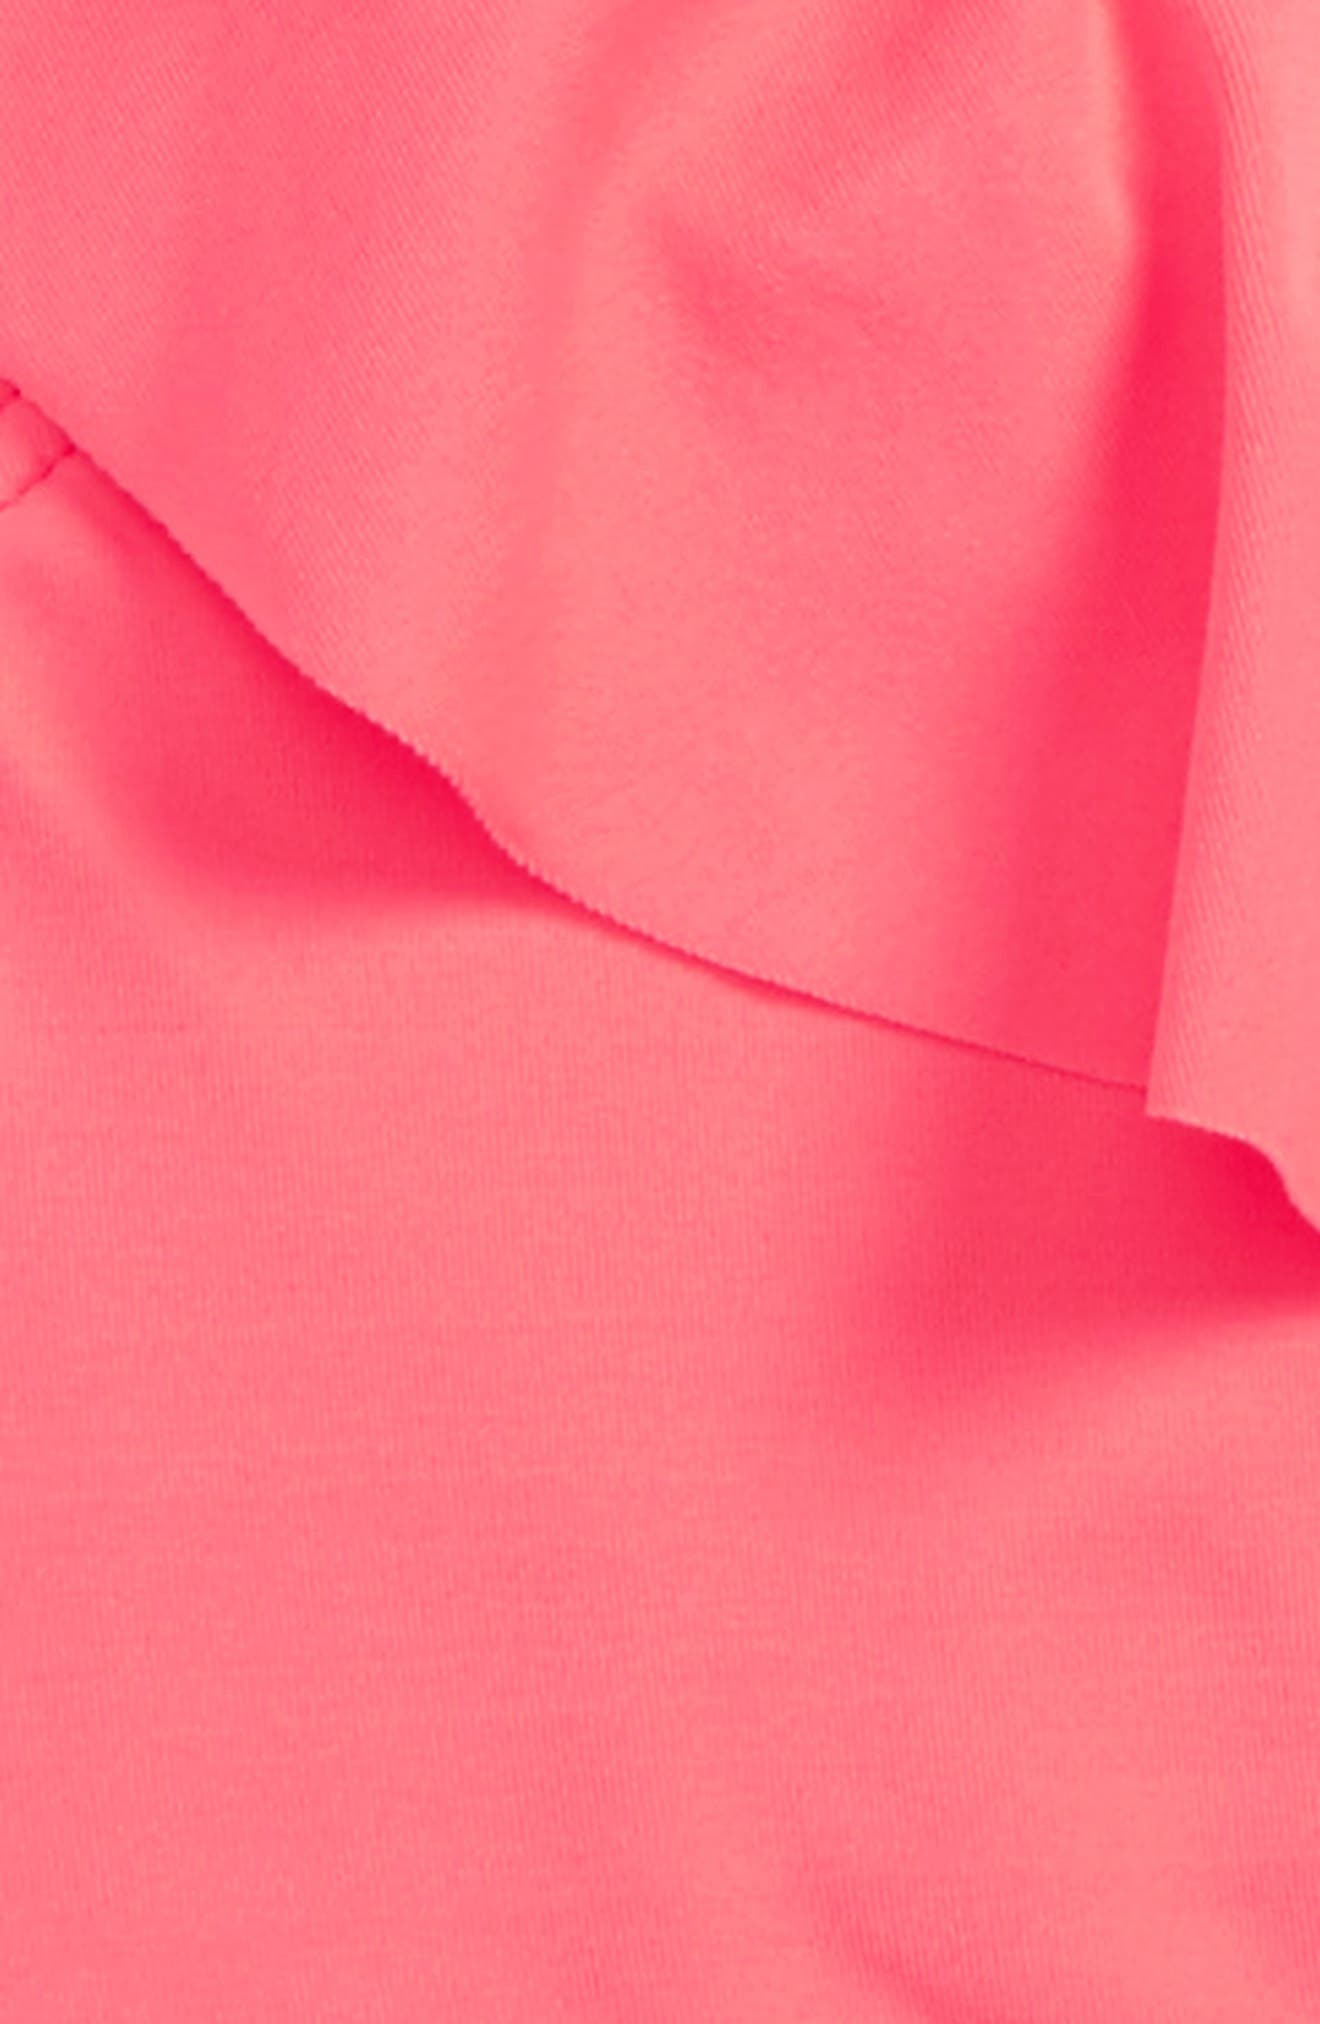 Sol Searcher Two-Piece Swimsuit,                             Alternate thumbnail 4, color,                             Neon Coral